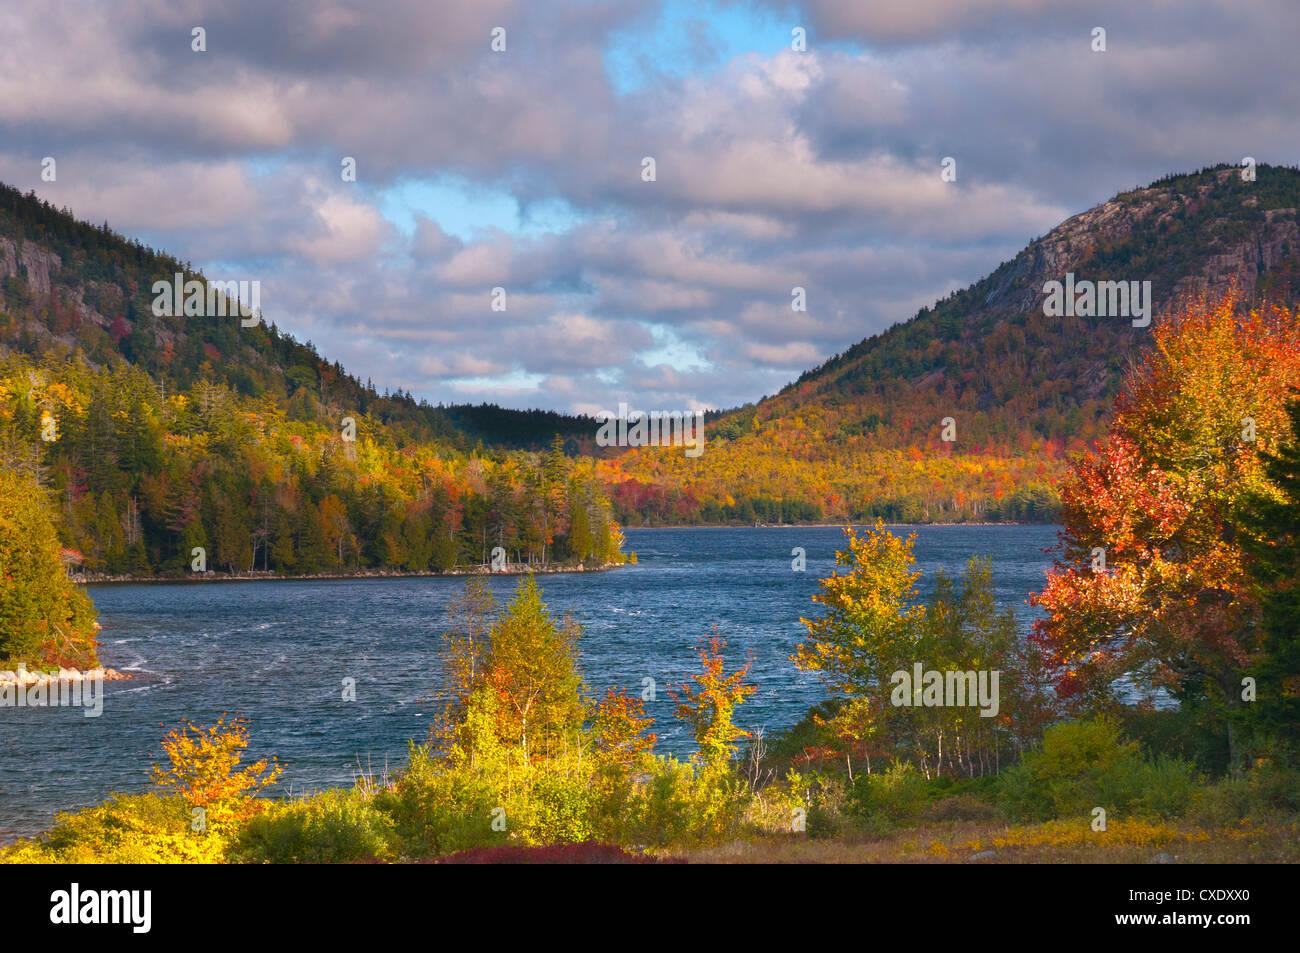 Eagle Lake, Acadia National Park, Mount Desert Island, Maine, New England, United States of America, North America - Stock Image